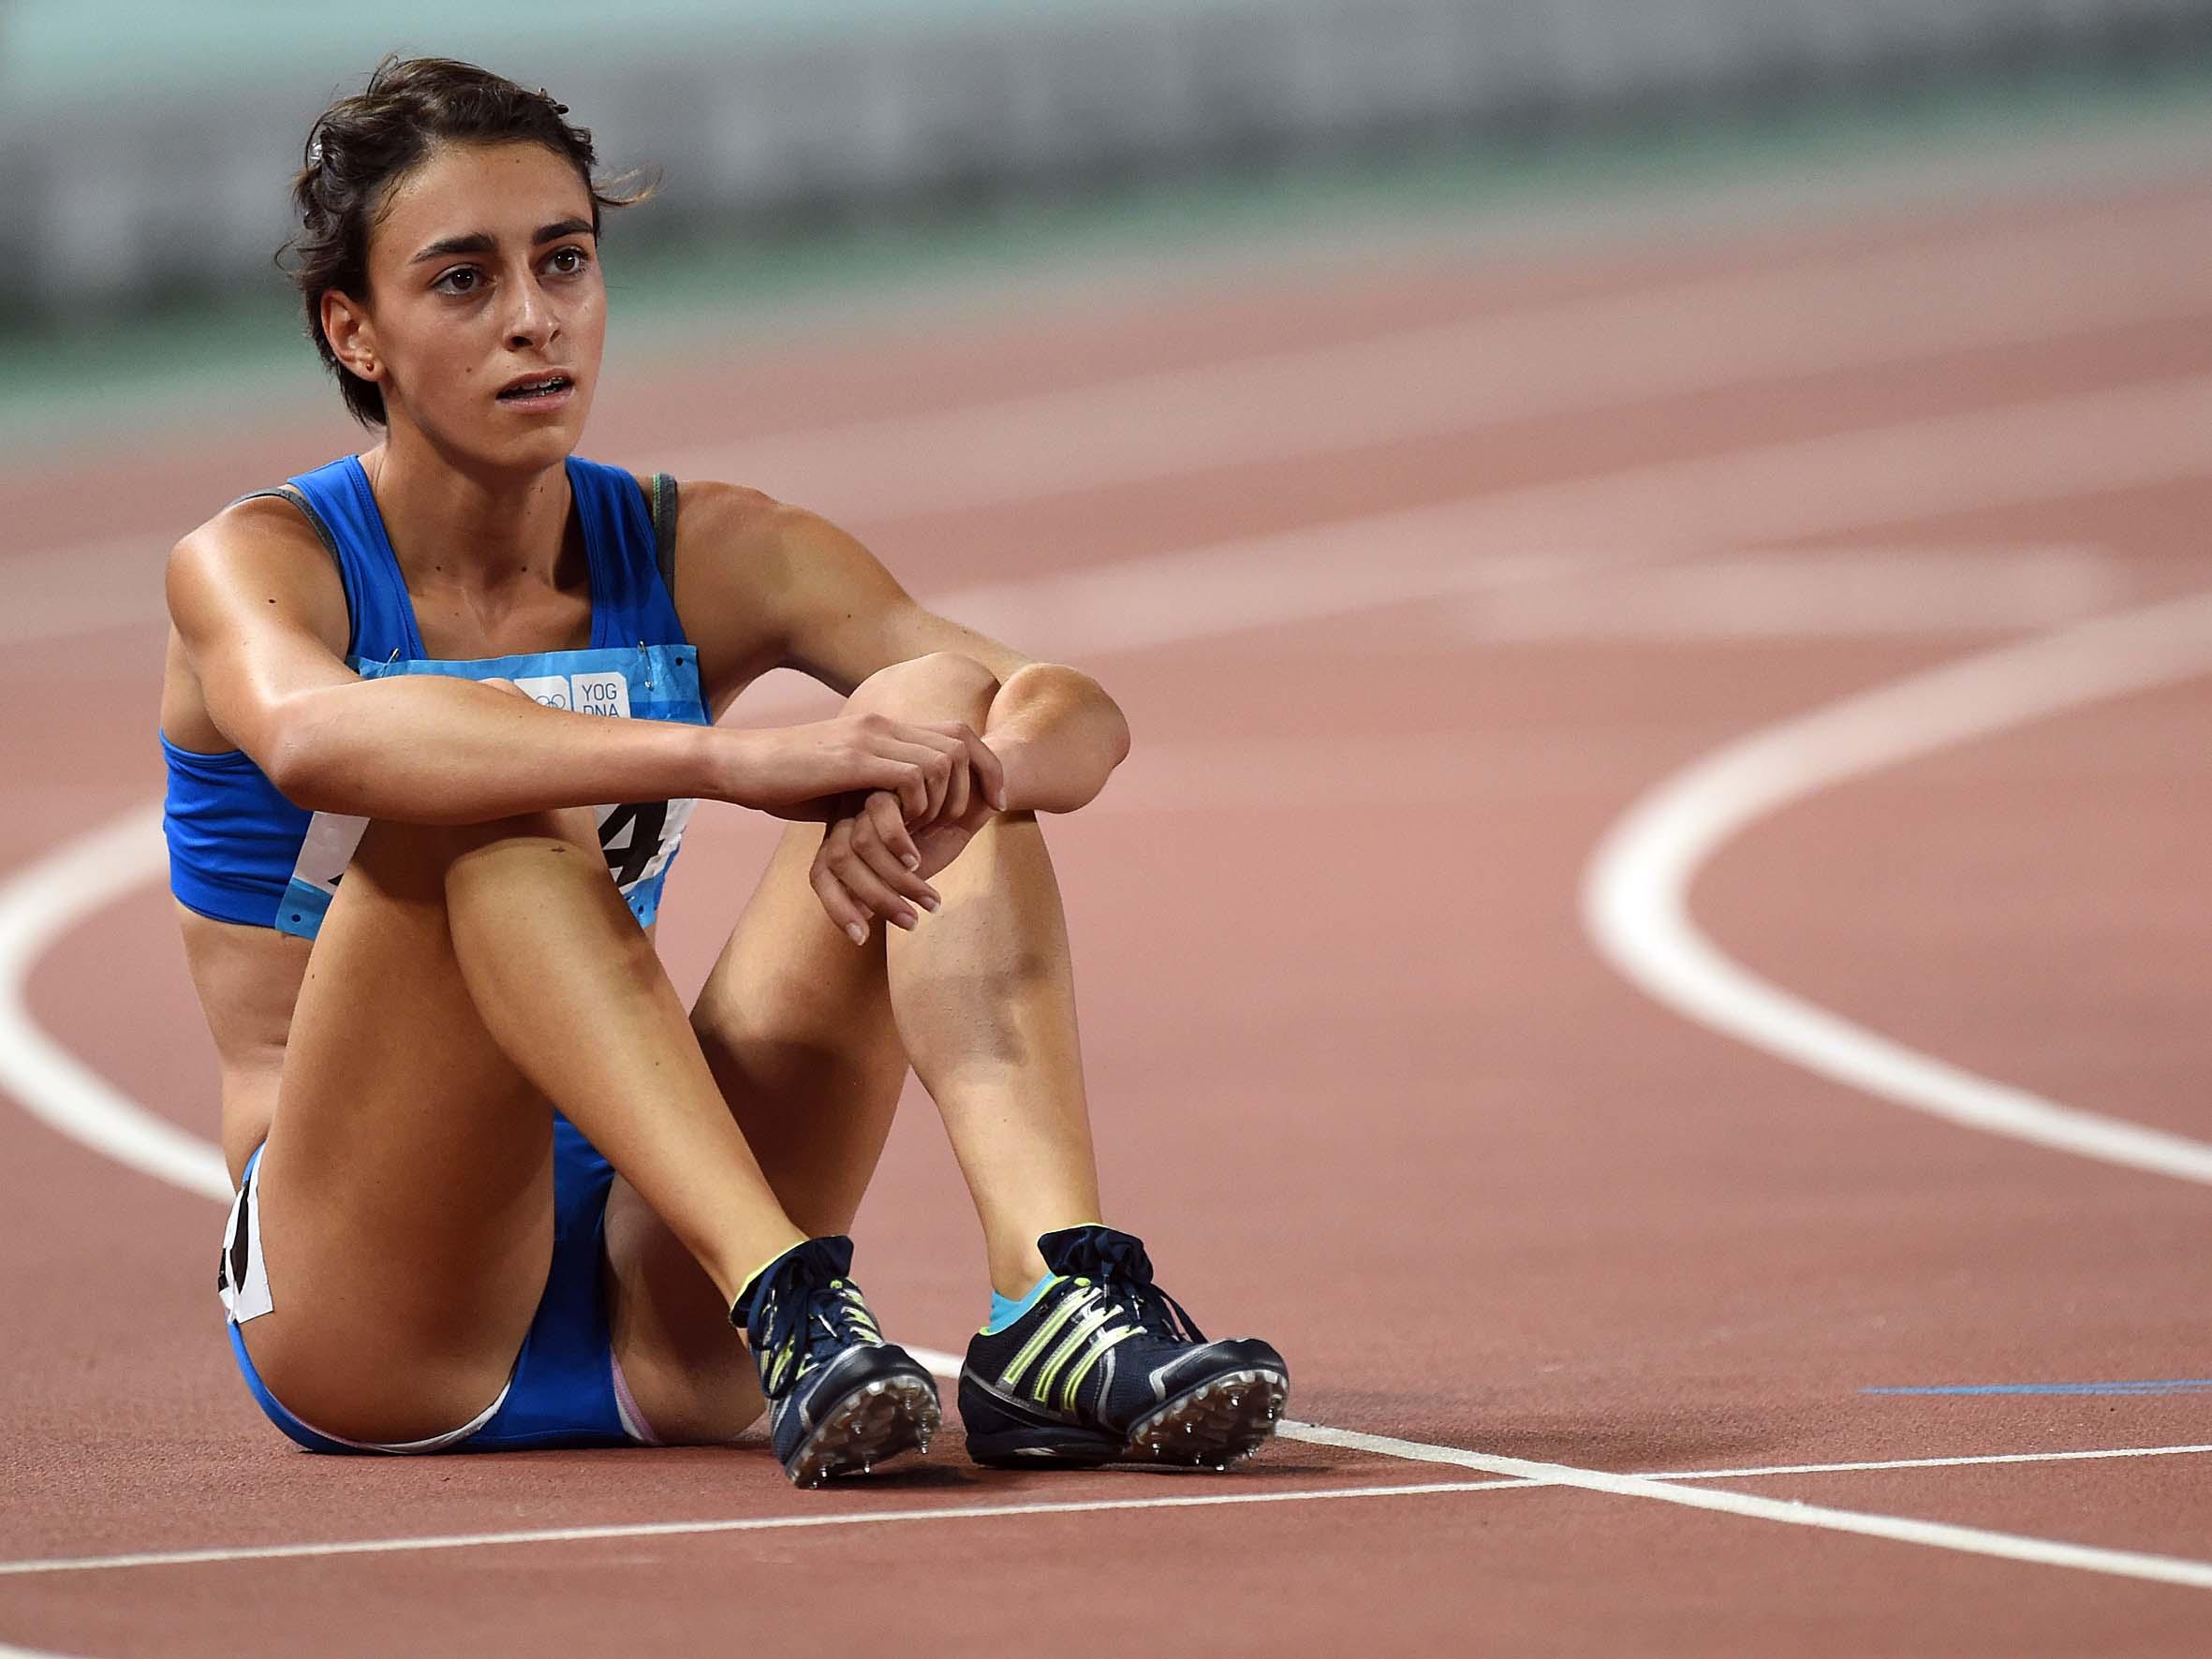 Atletica donne 400 metri 06